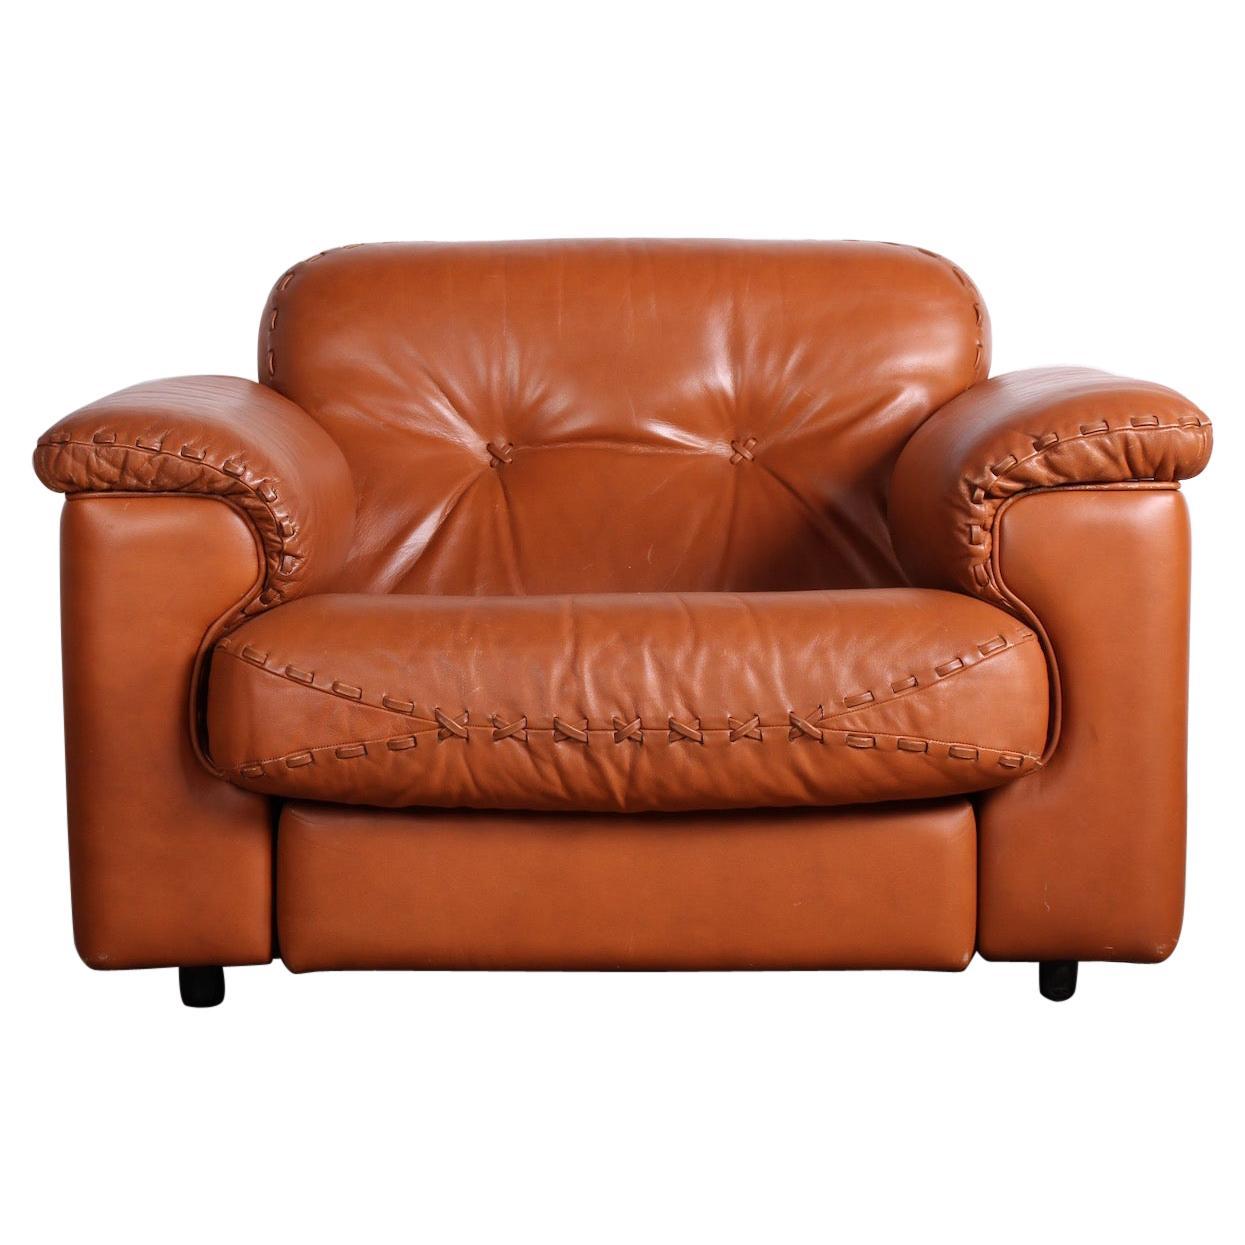 "De Sede ""DS-101"" Leather Lounge Chair"